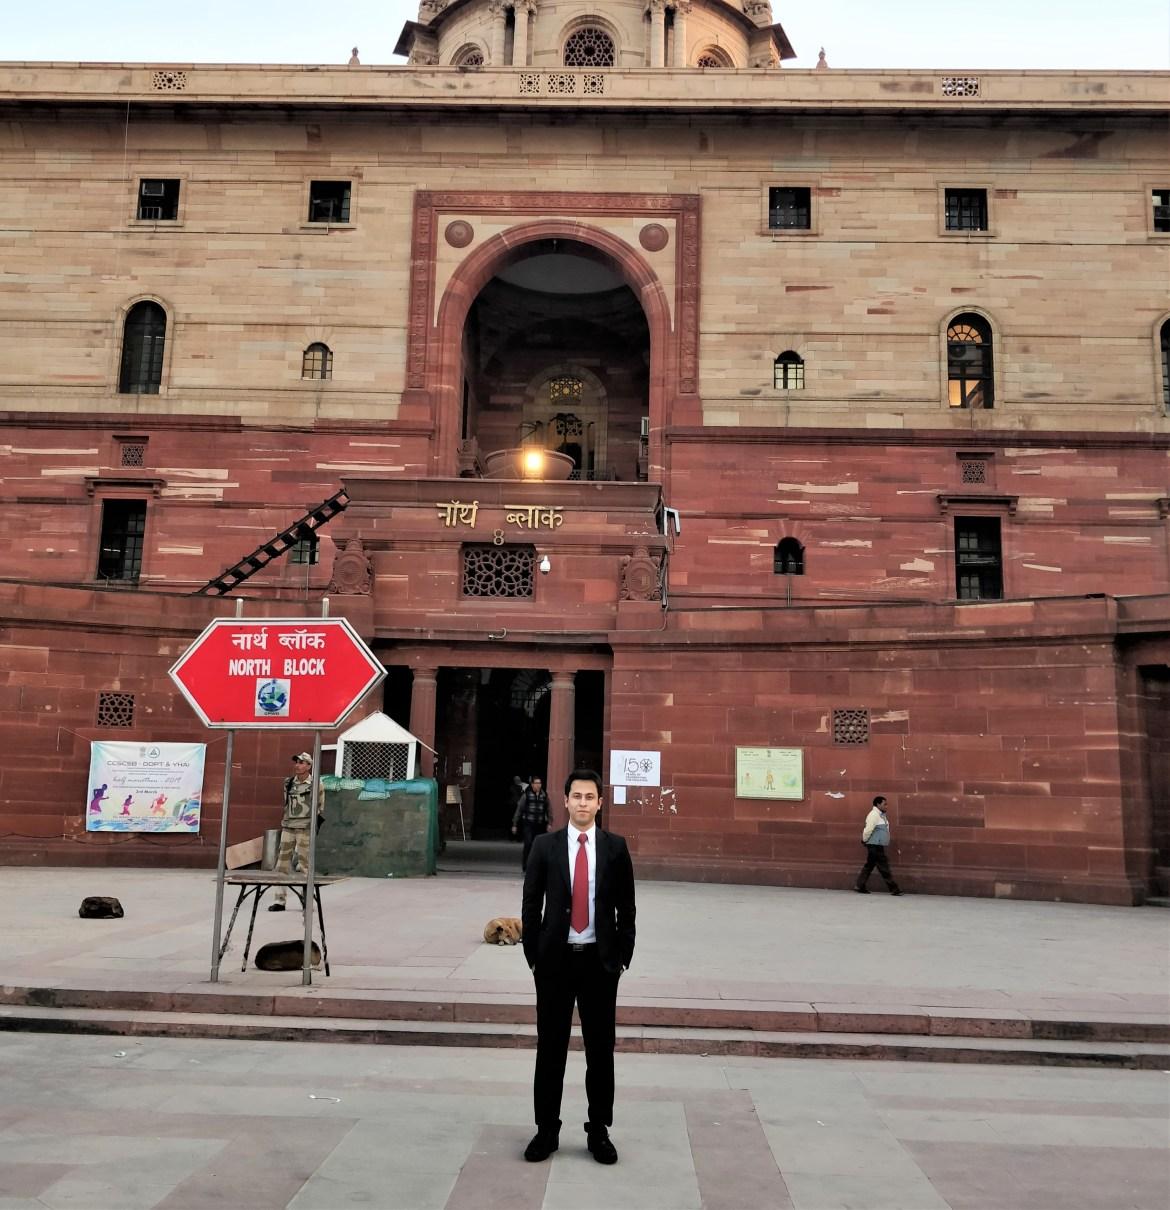 Kumar Anurag Rank 48 IAS topper